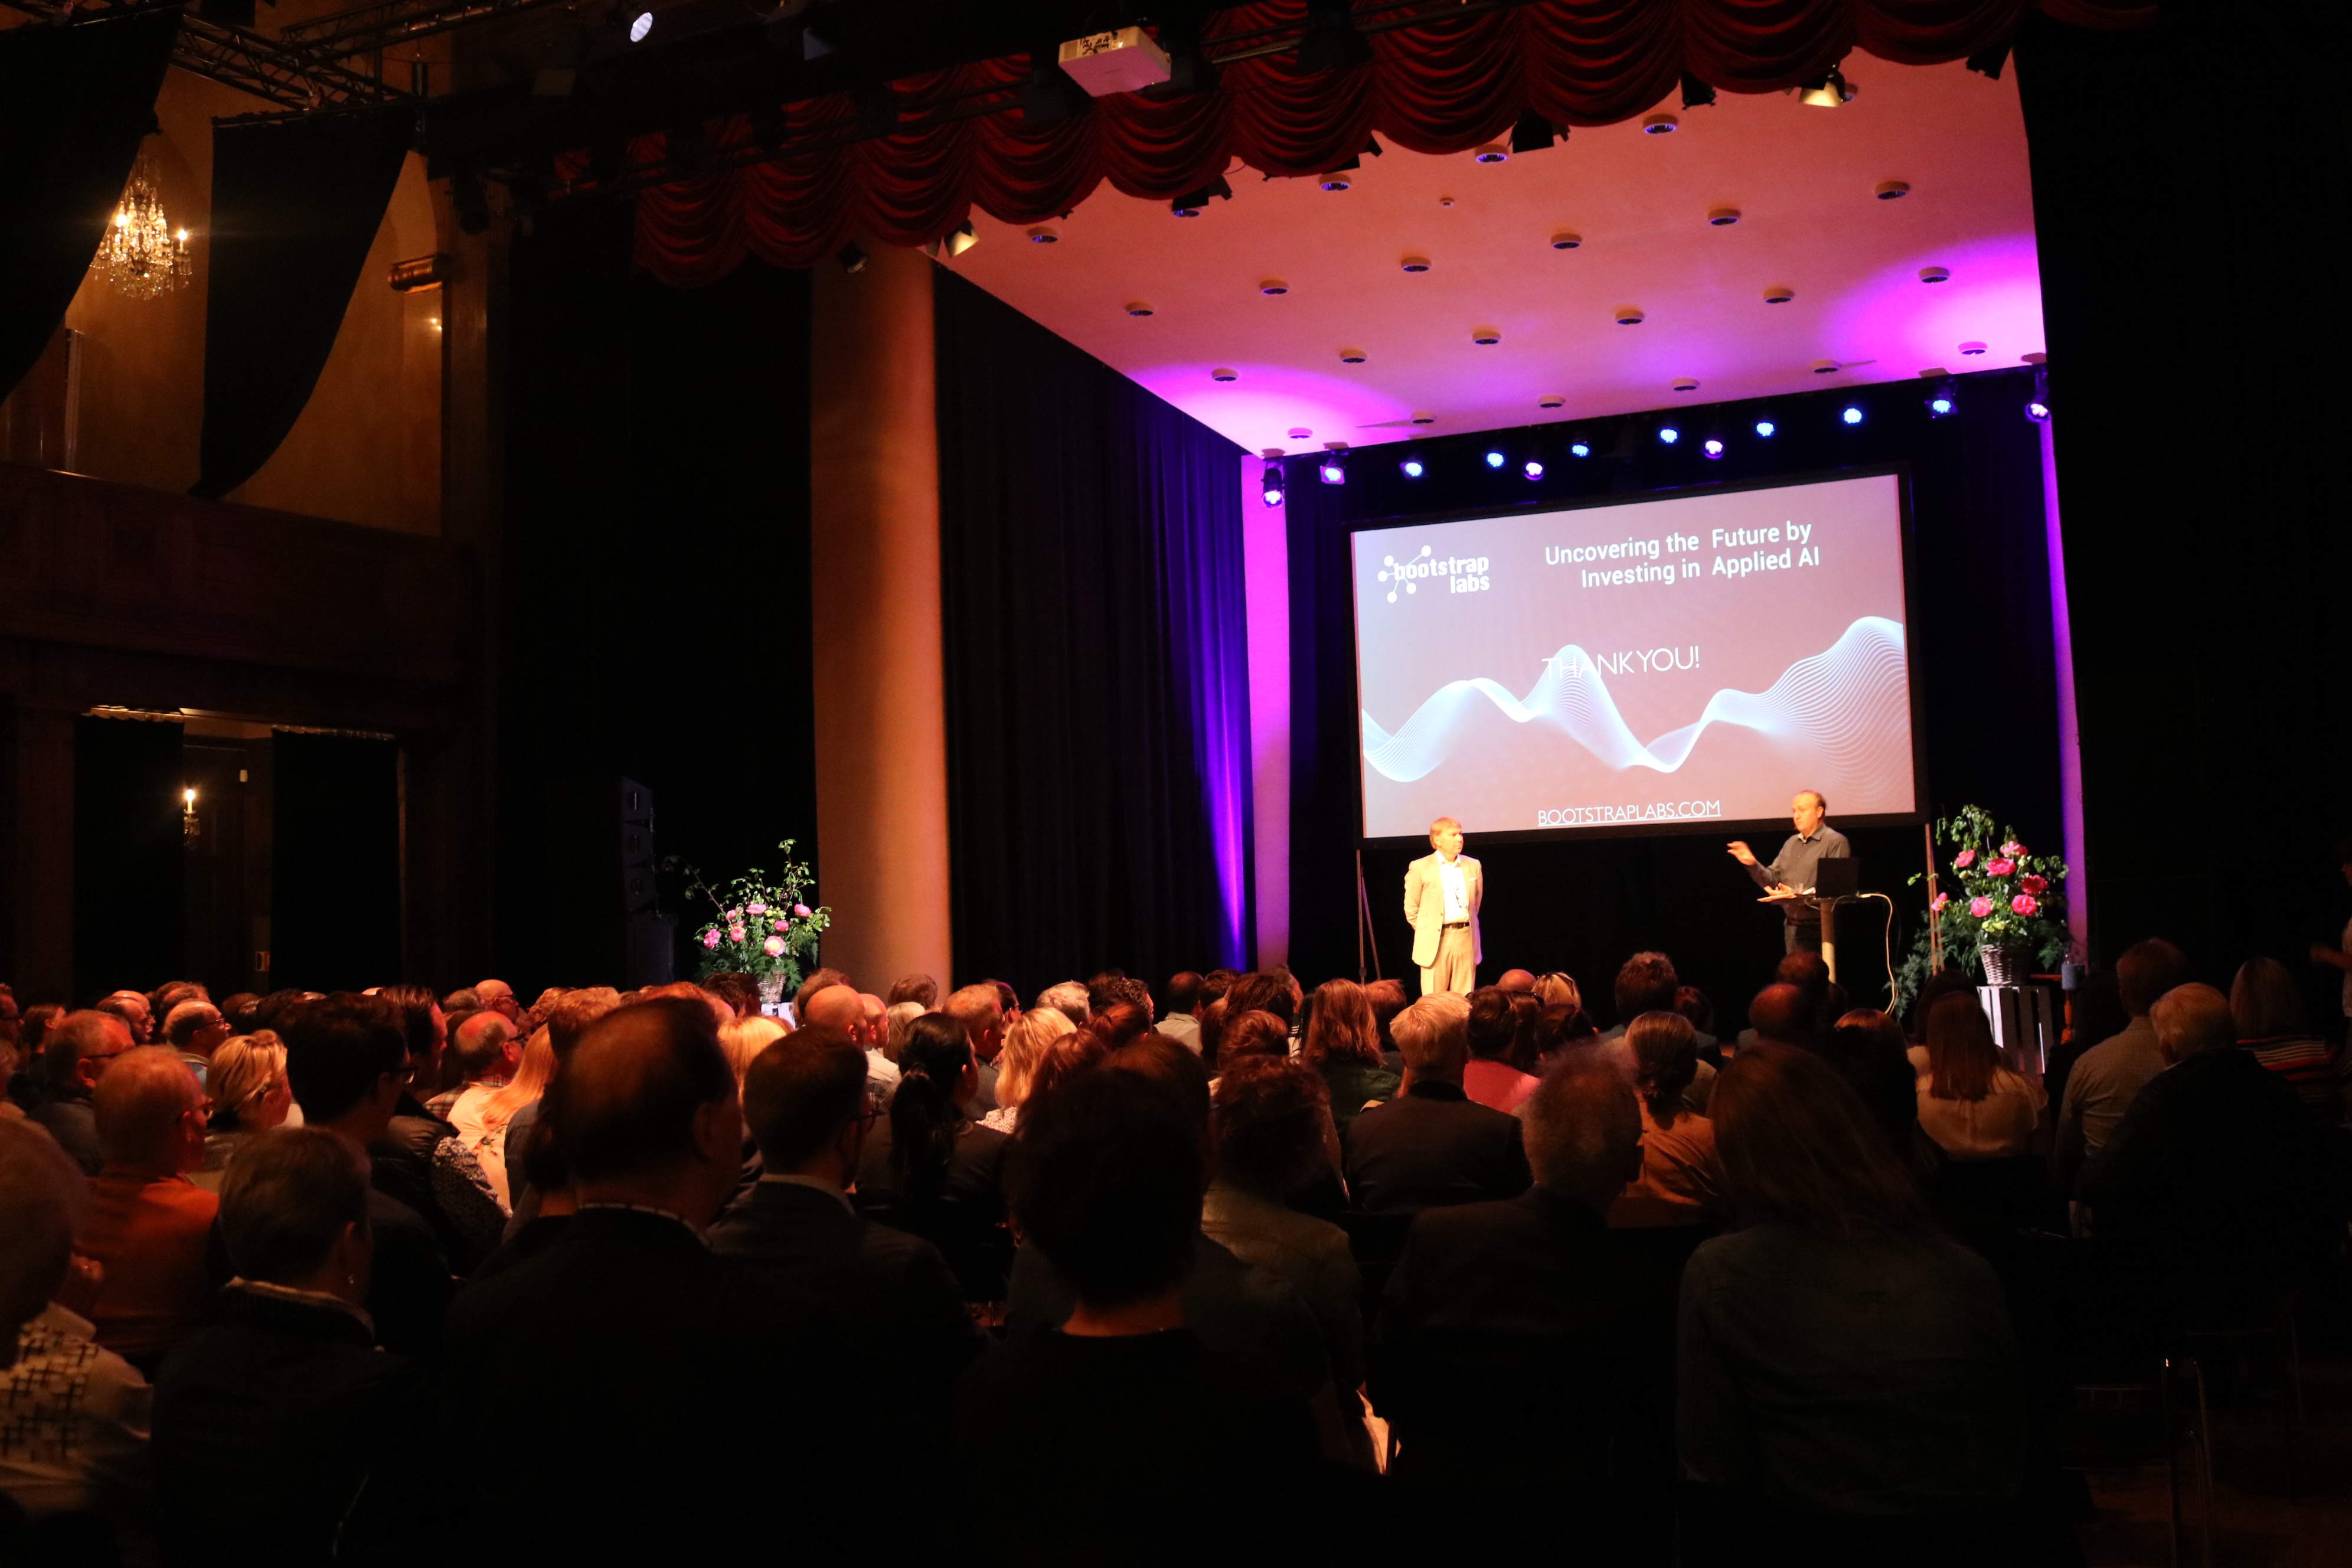 nicolai_wadstrom_malmo_event